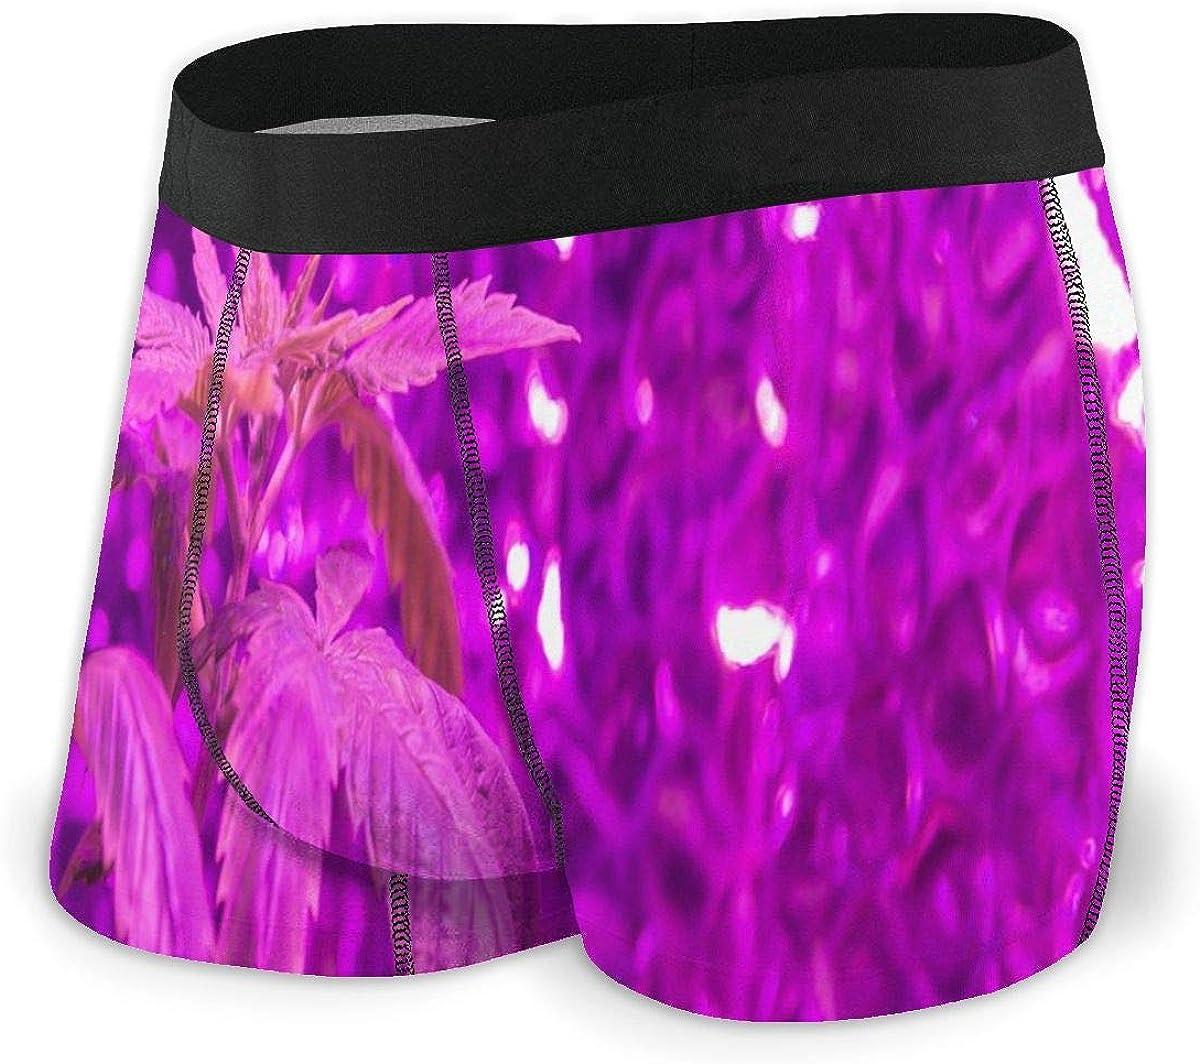 Mens Boxer Briefs Medical Marijuana Purple Bikini Underwear Stretch Low Rise Trunks Boys Underpants